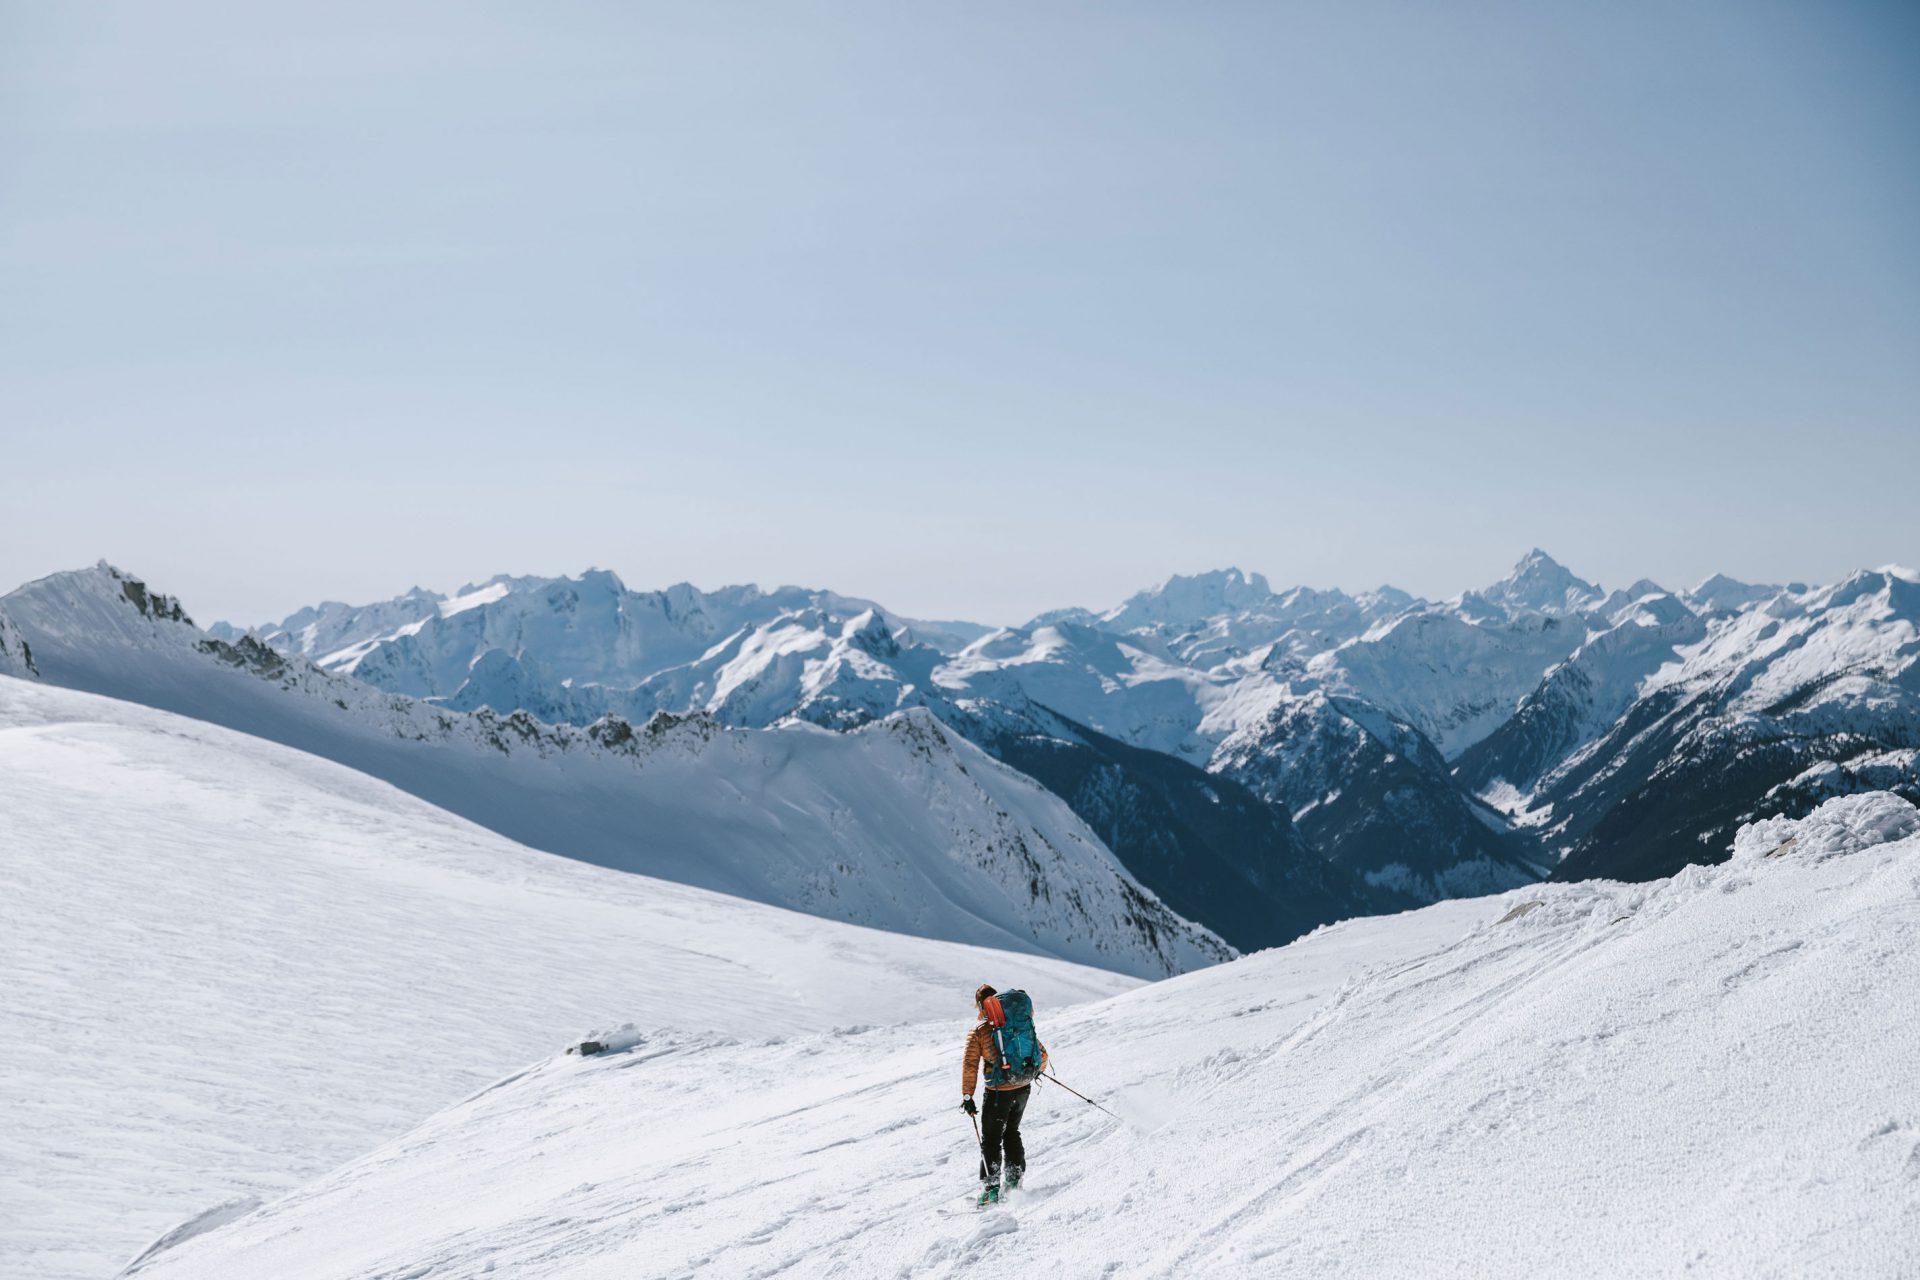 Man skiing on the mountain range